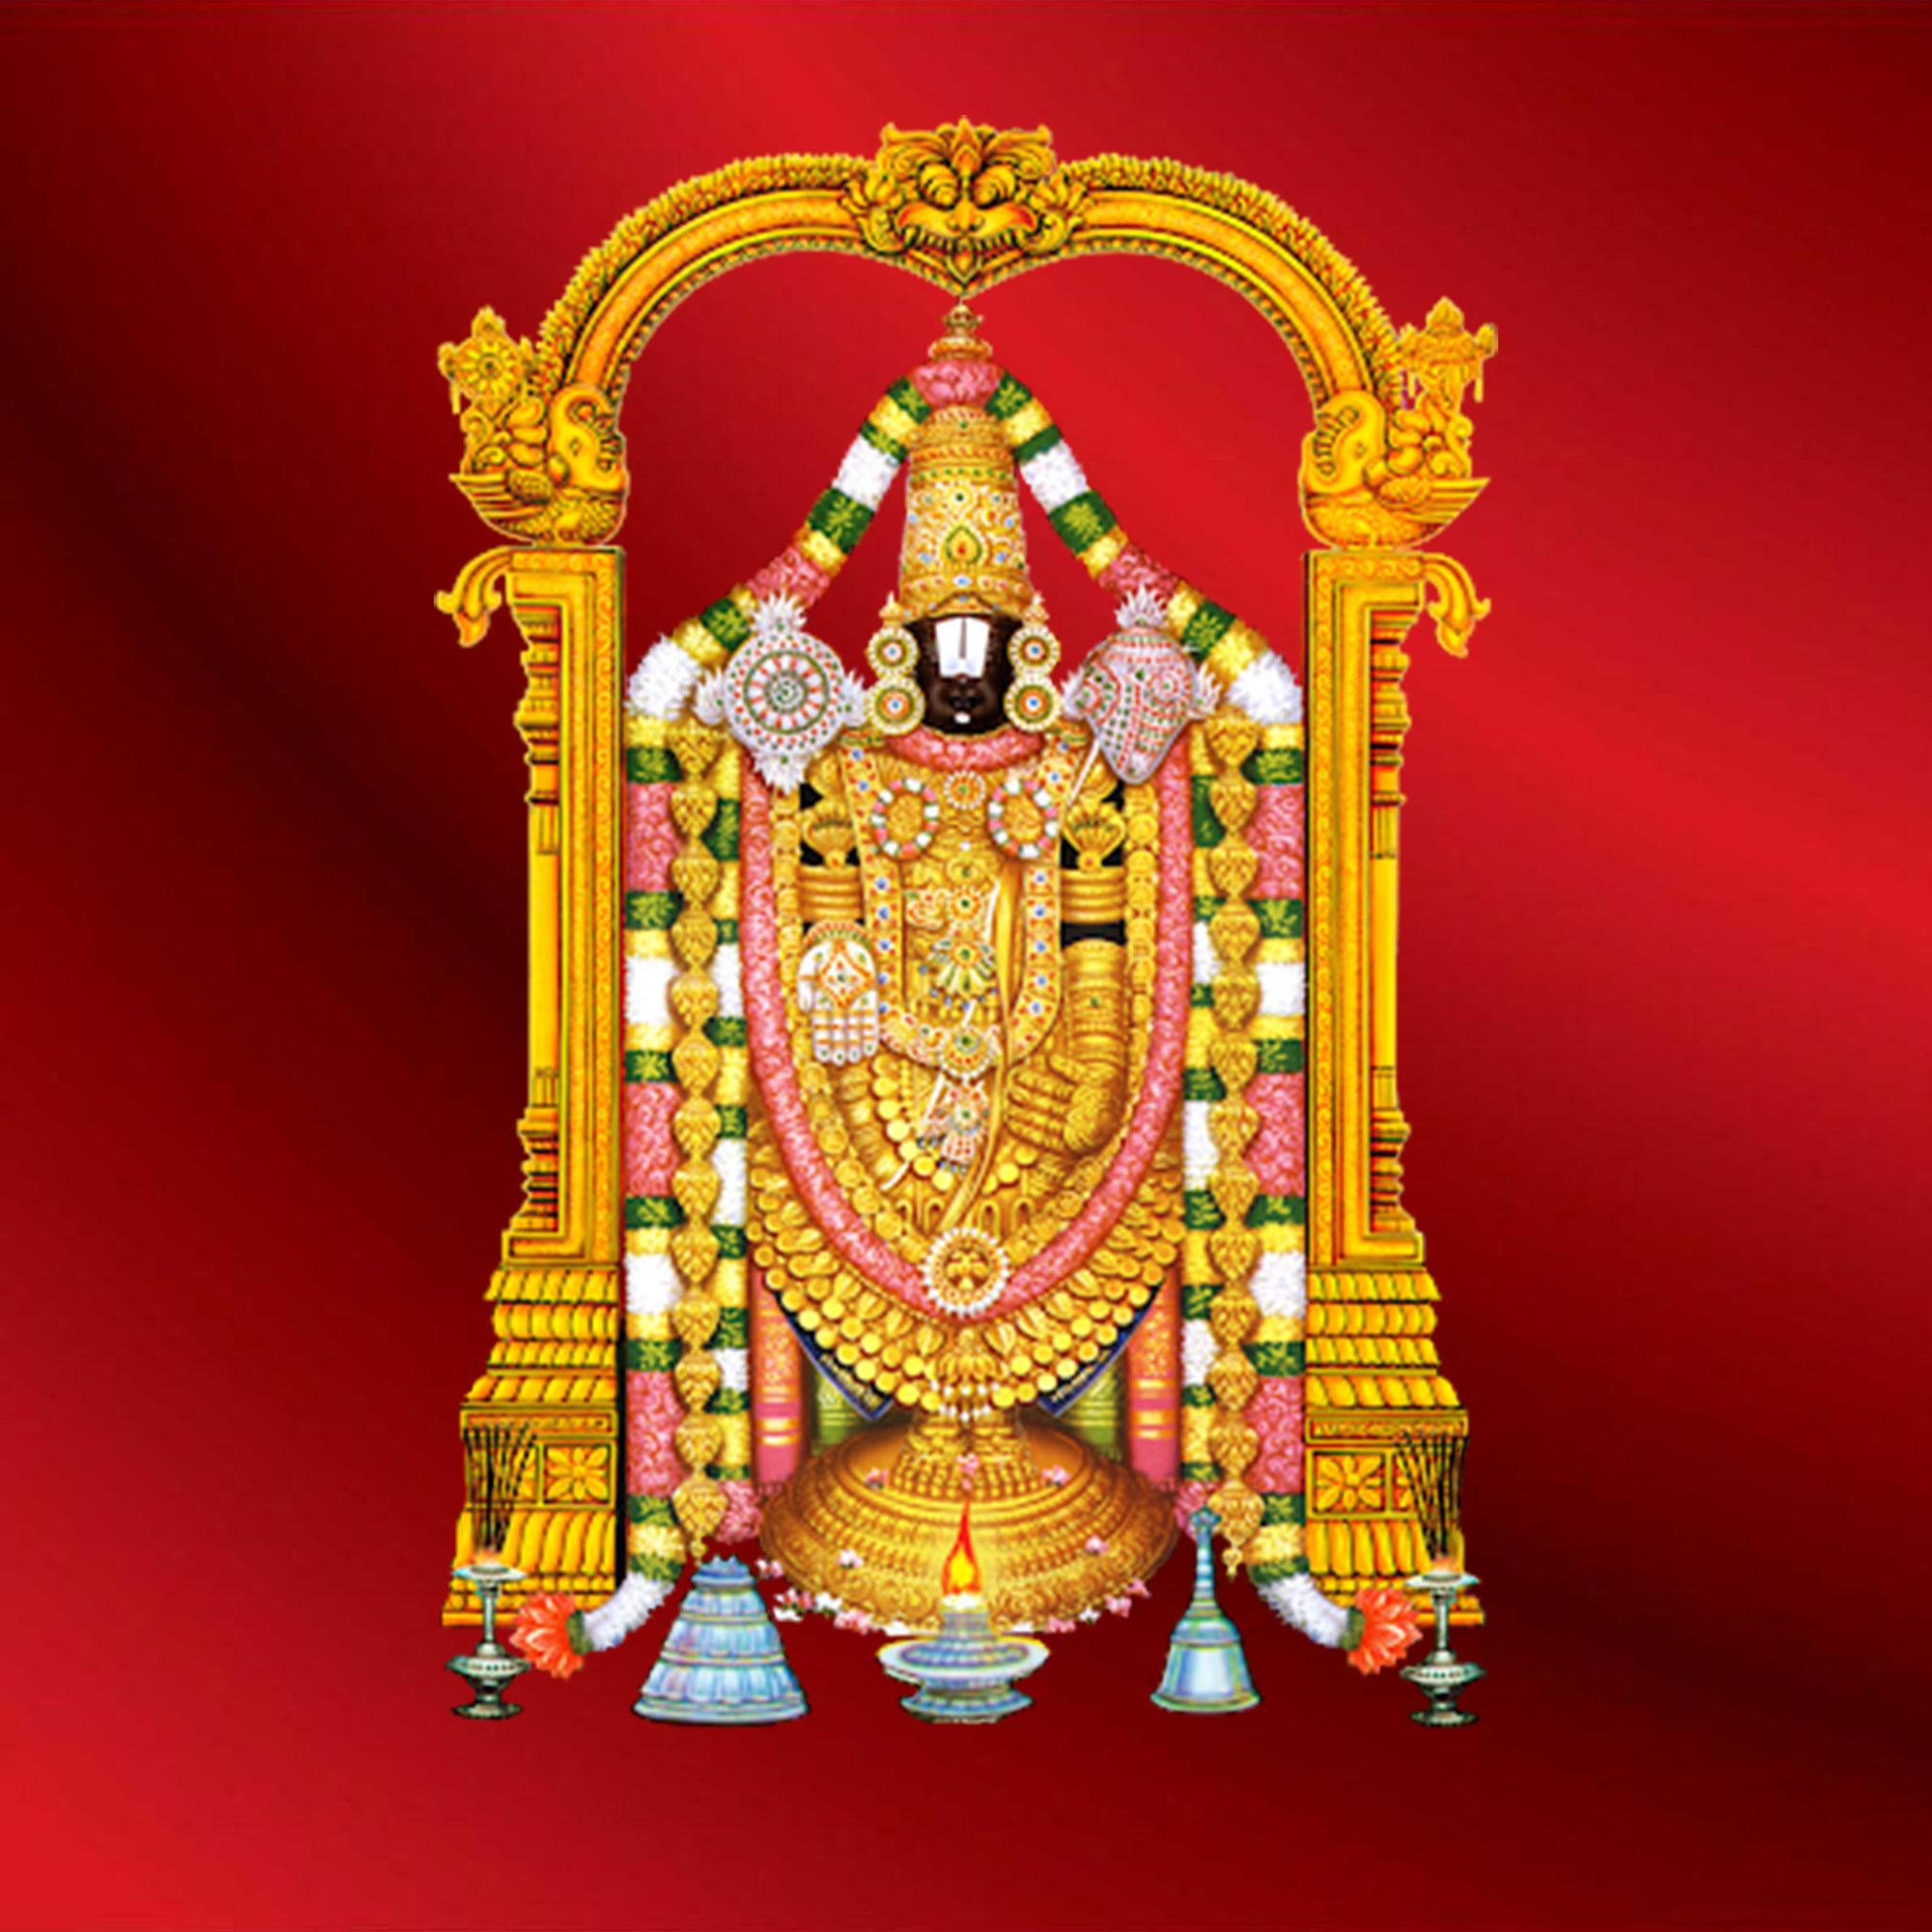 venkateswara swamy images and hd wallpaper for mobile shyamparivar